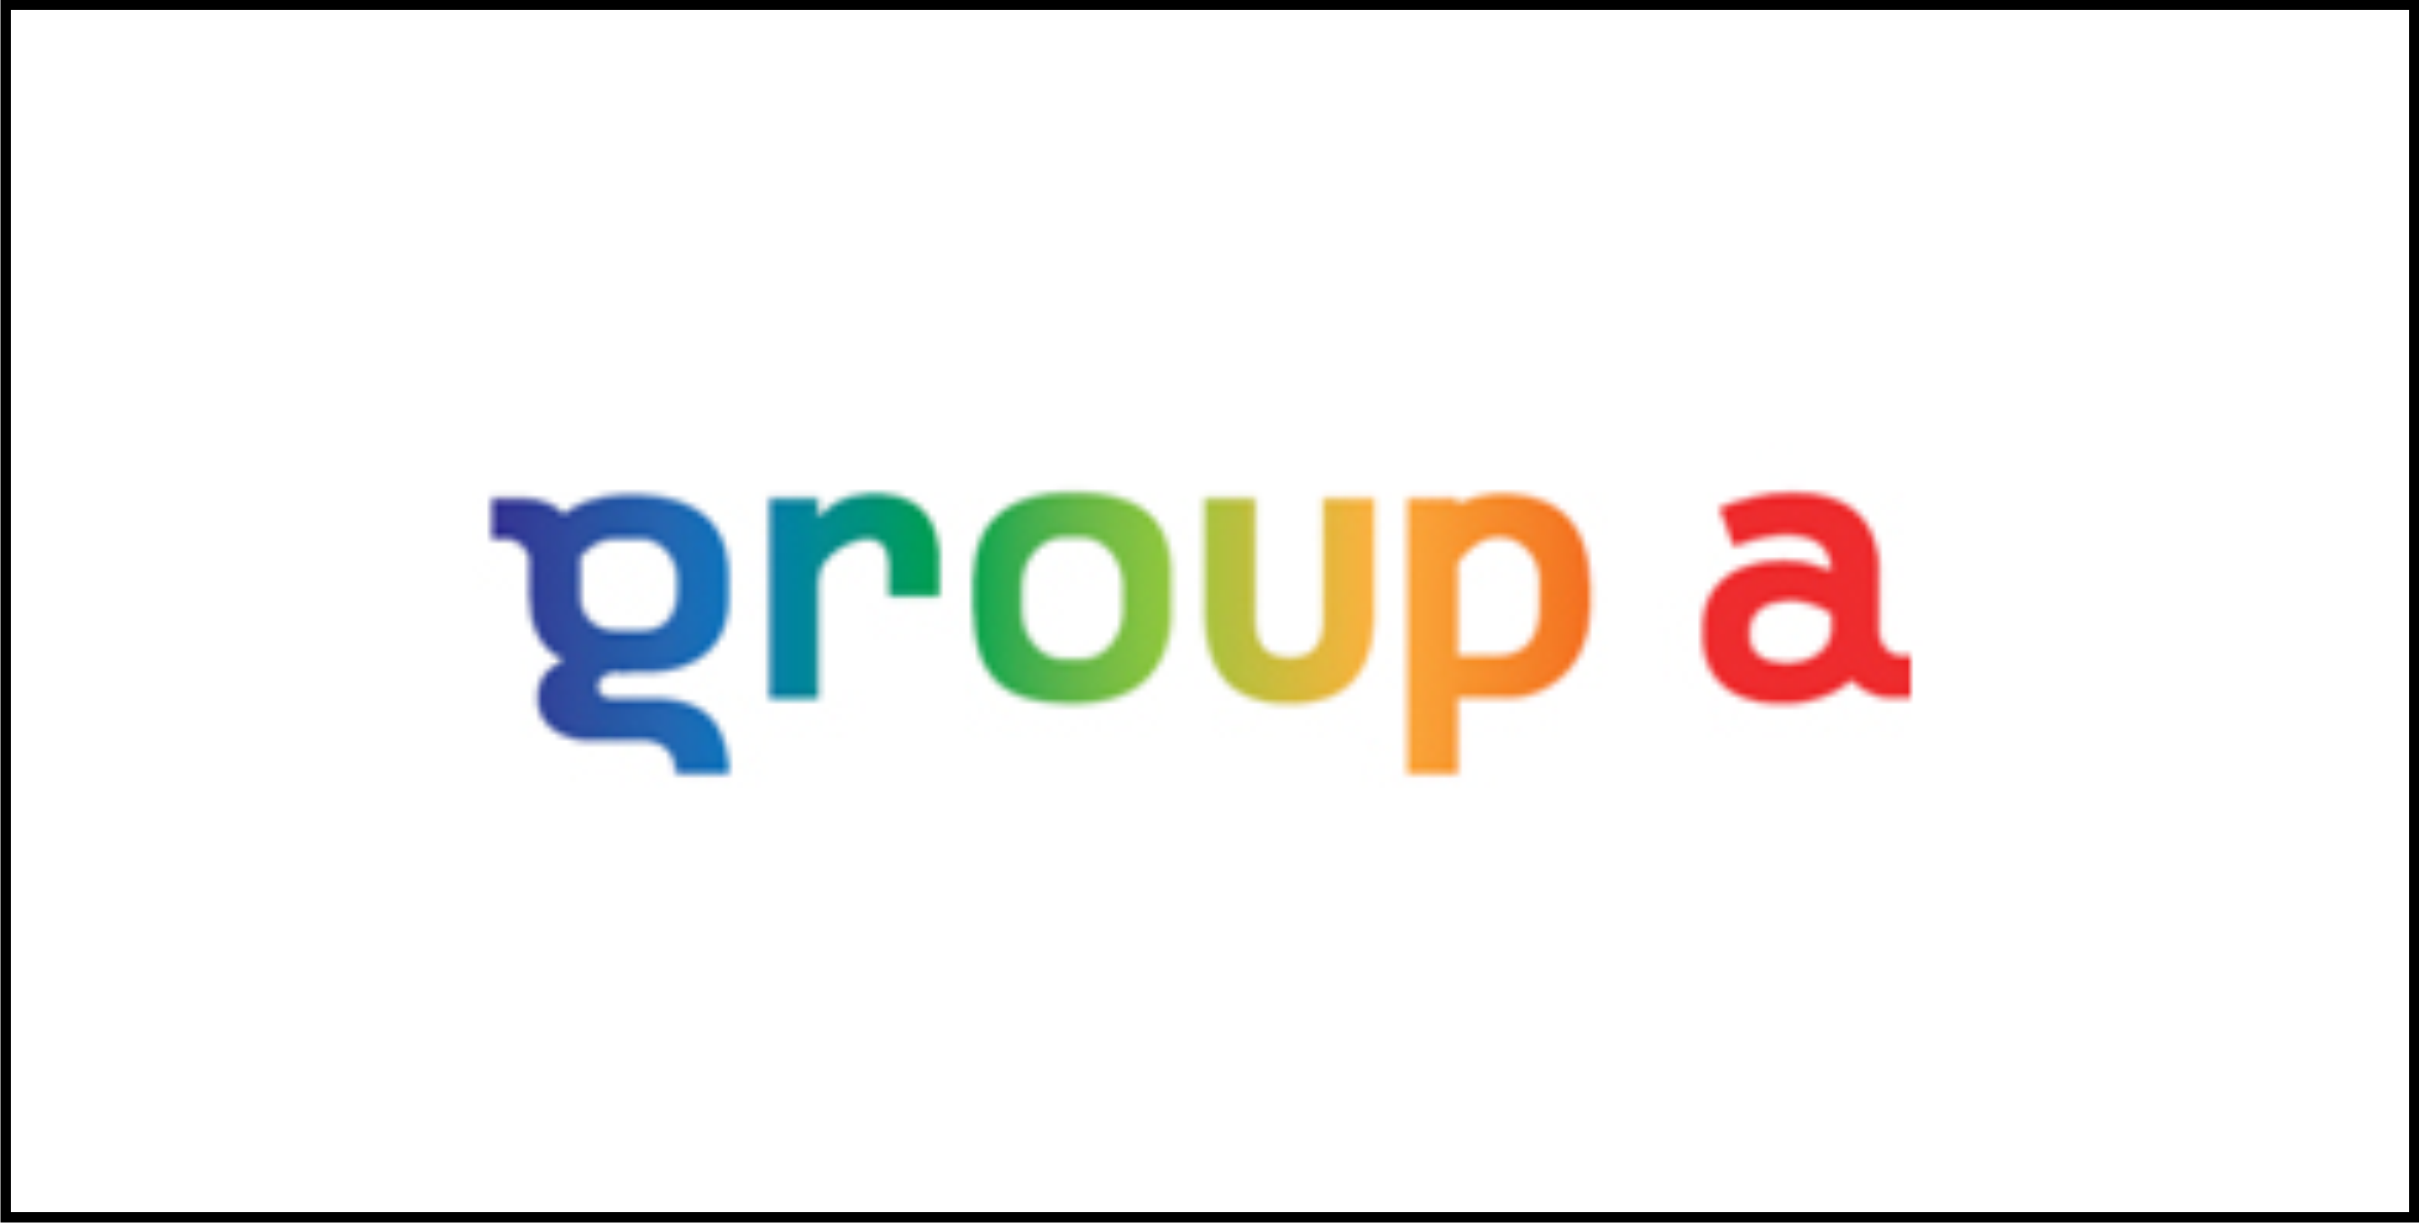 Group-A